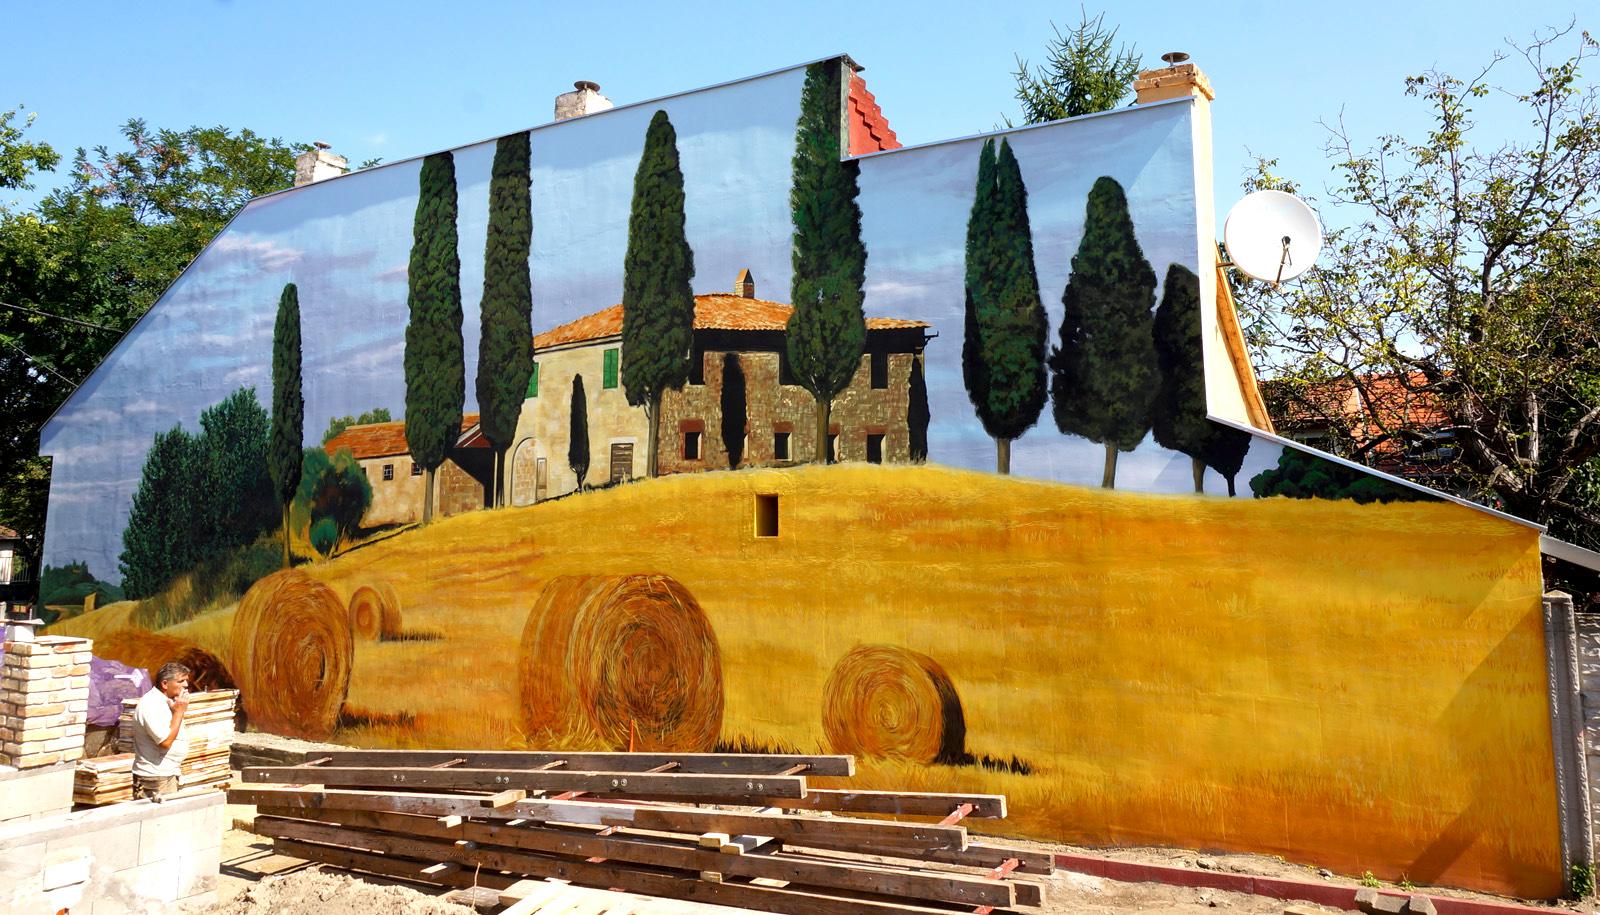 neopaint works - graffiti - homlokzat dekorfestés